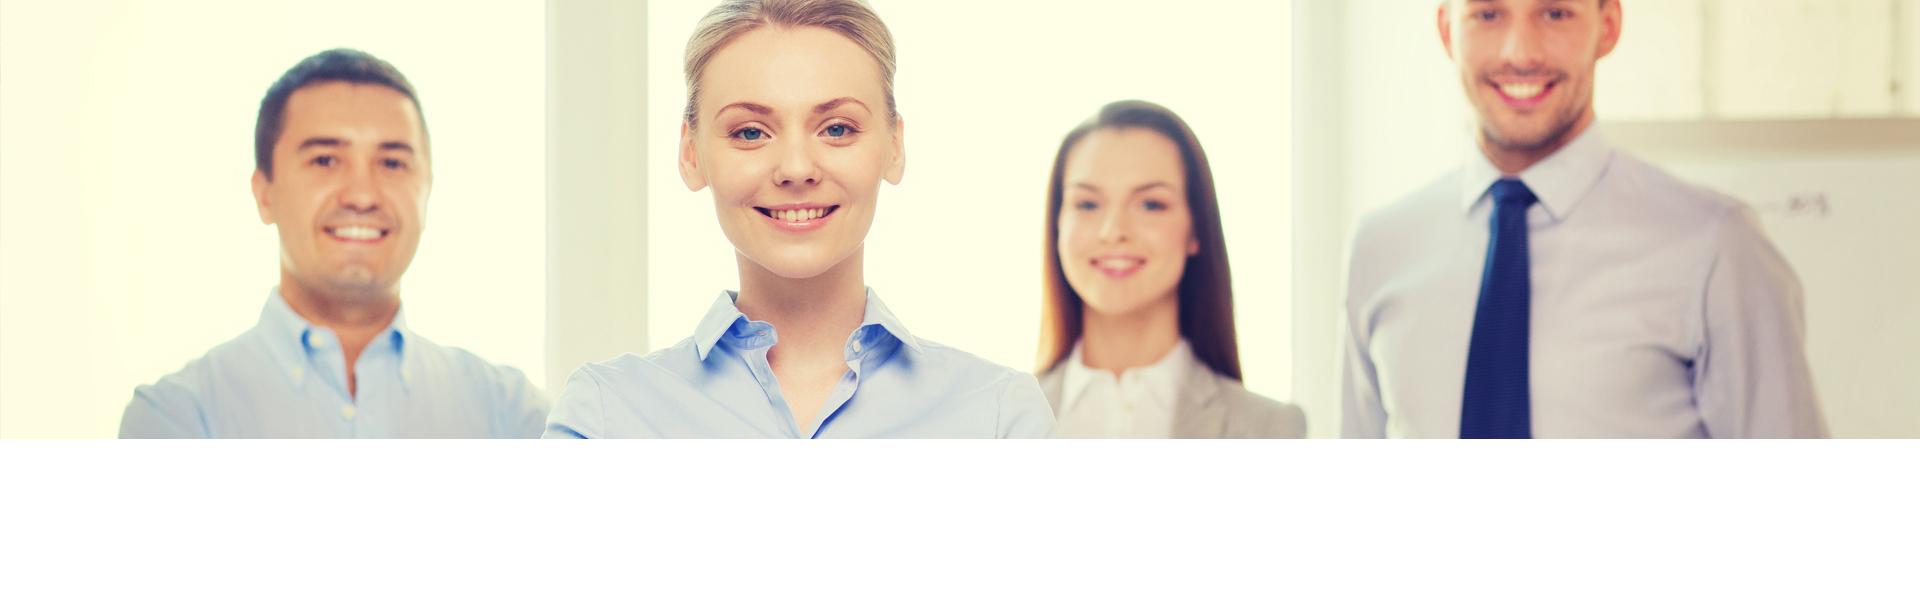 accounting jobs & banking jobs, compliance jobs, tax jobs & vat jobs, finance jobs, legal jobs